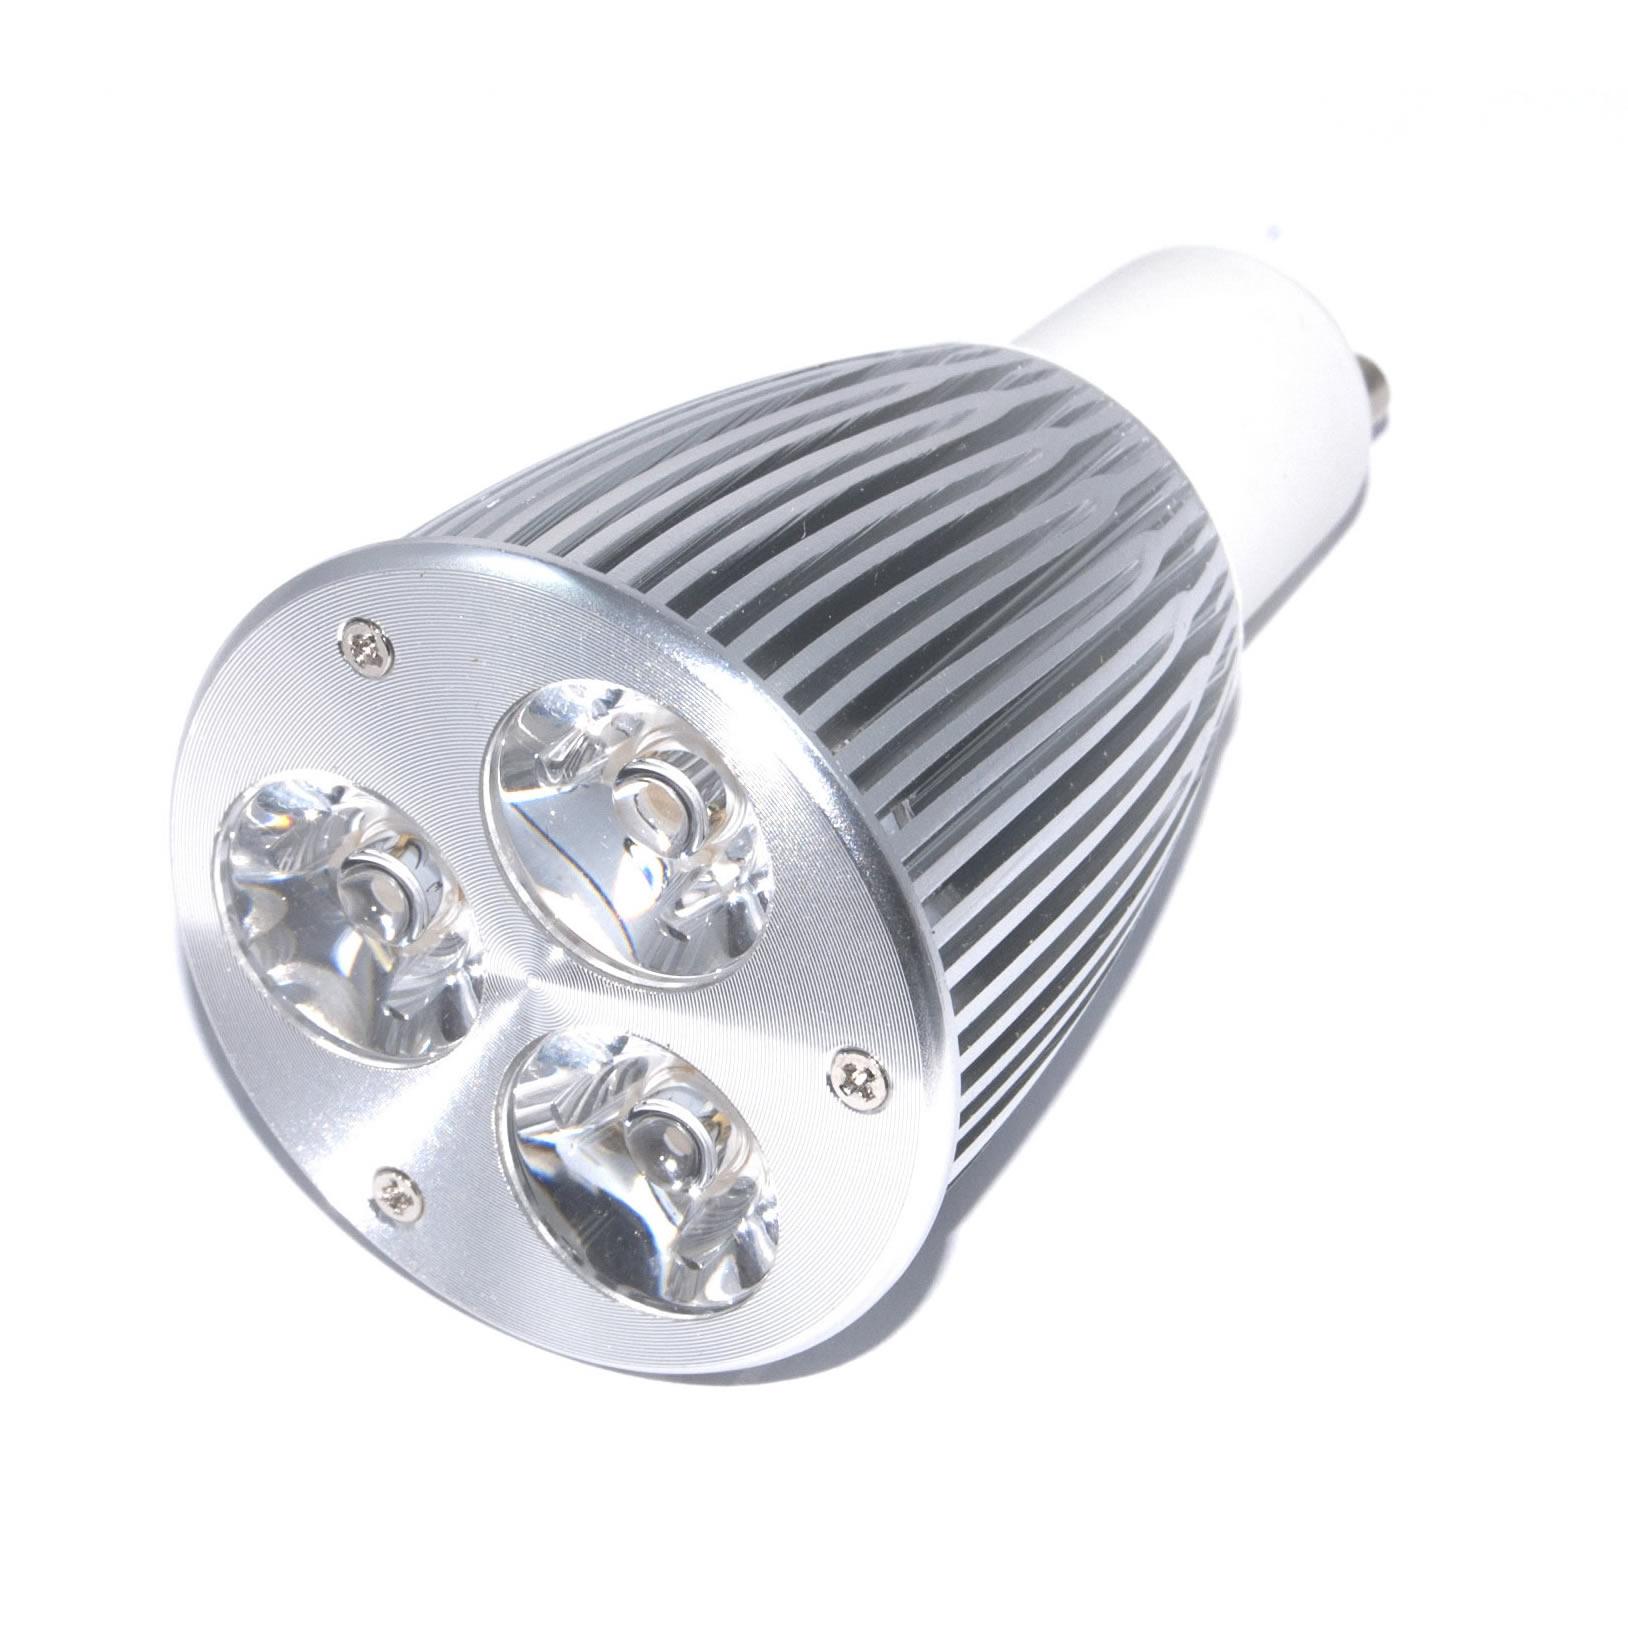 Gu10 powerled 3x3w power led spot 9 watt warm wit 45 for Lampen 34 volt 3 watt